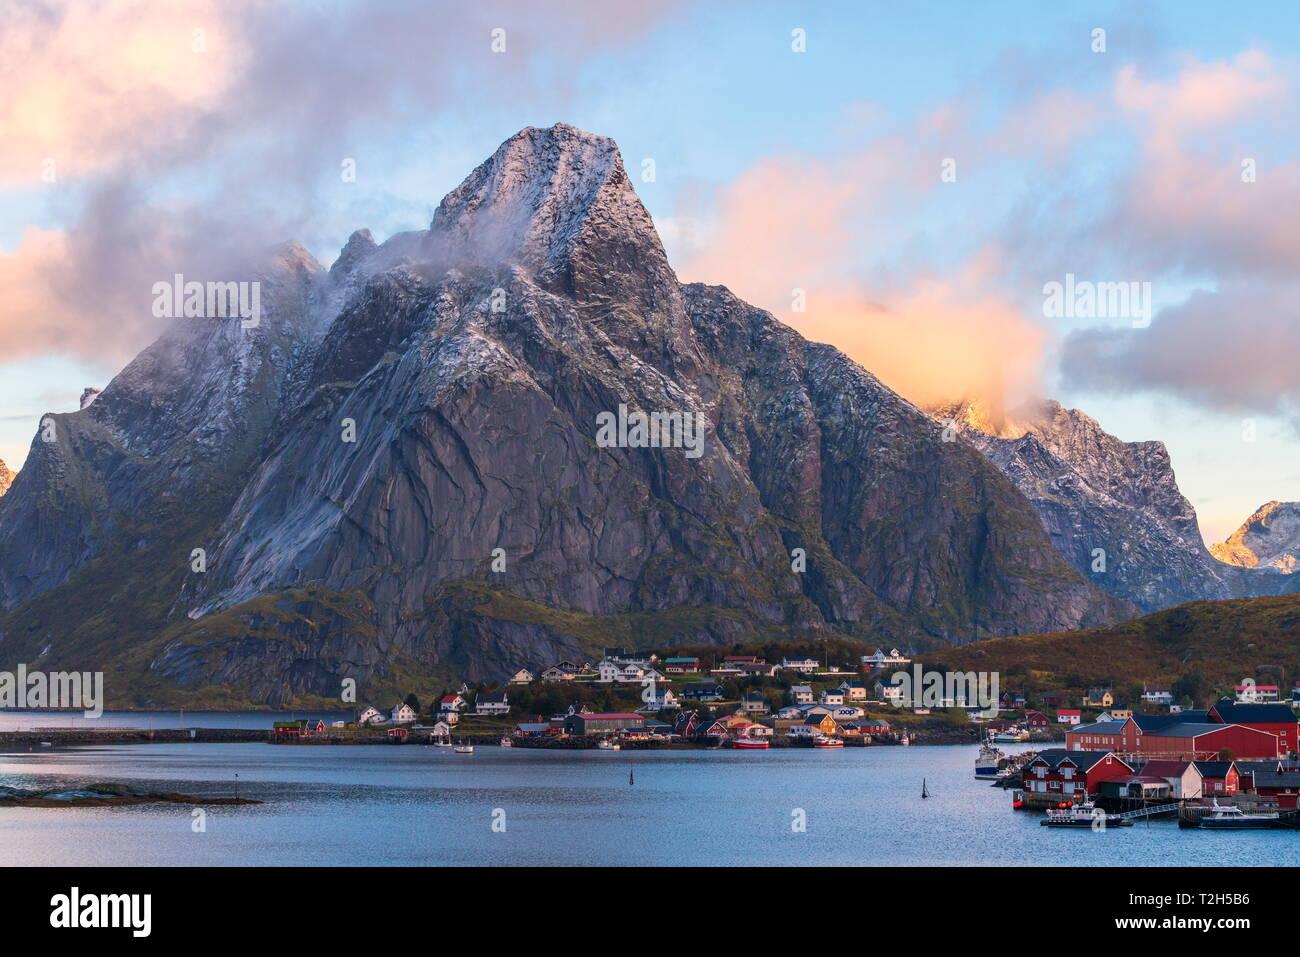 Olstinden mountain above town at sunset in Reine, Moskenes, Norway, Europe Stock Photo